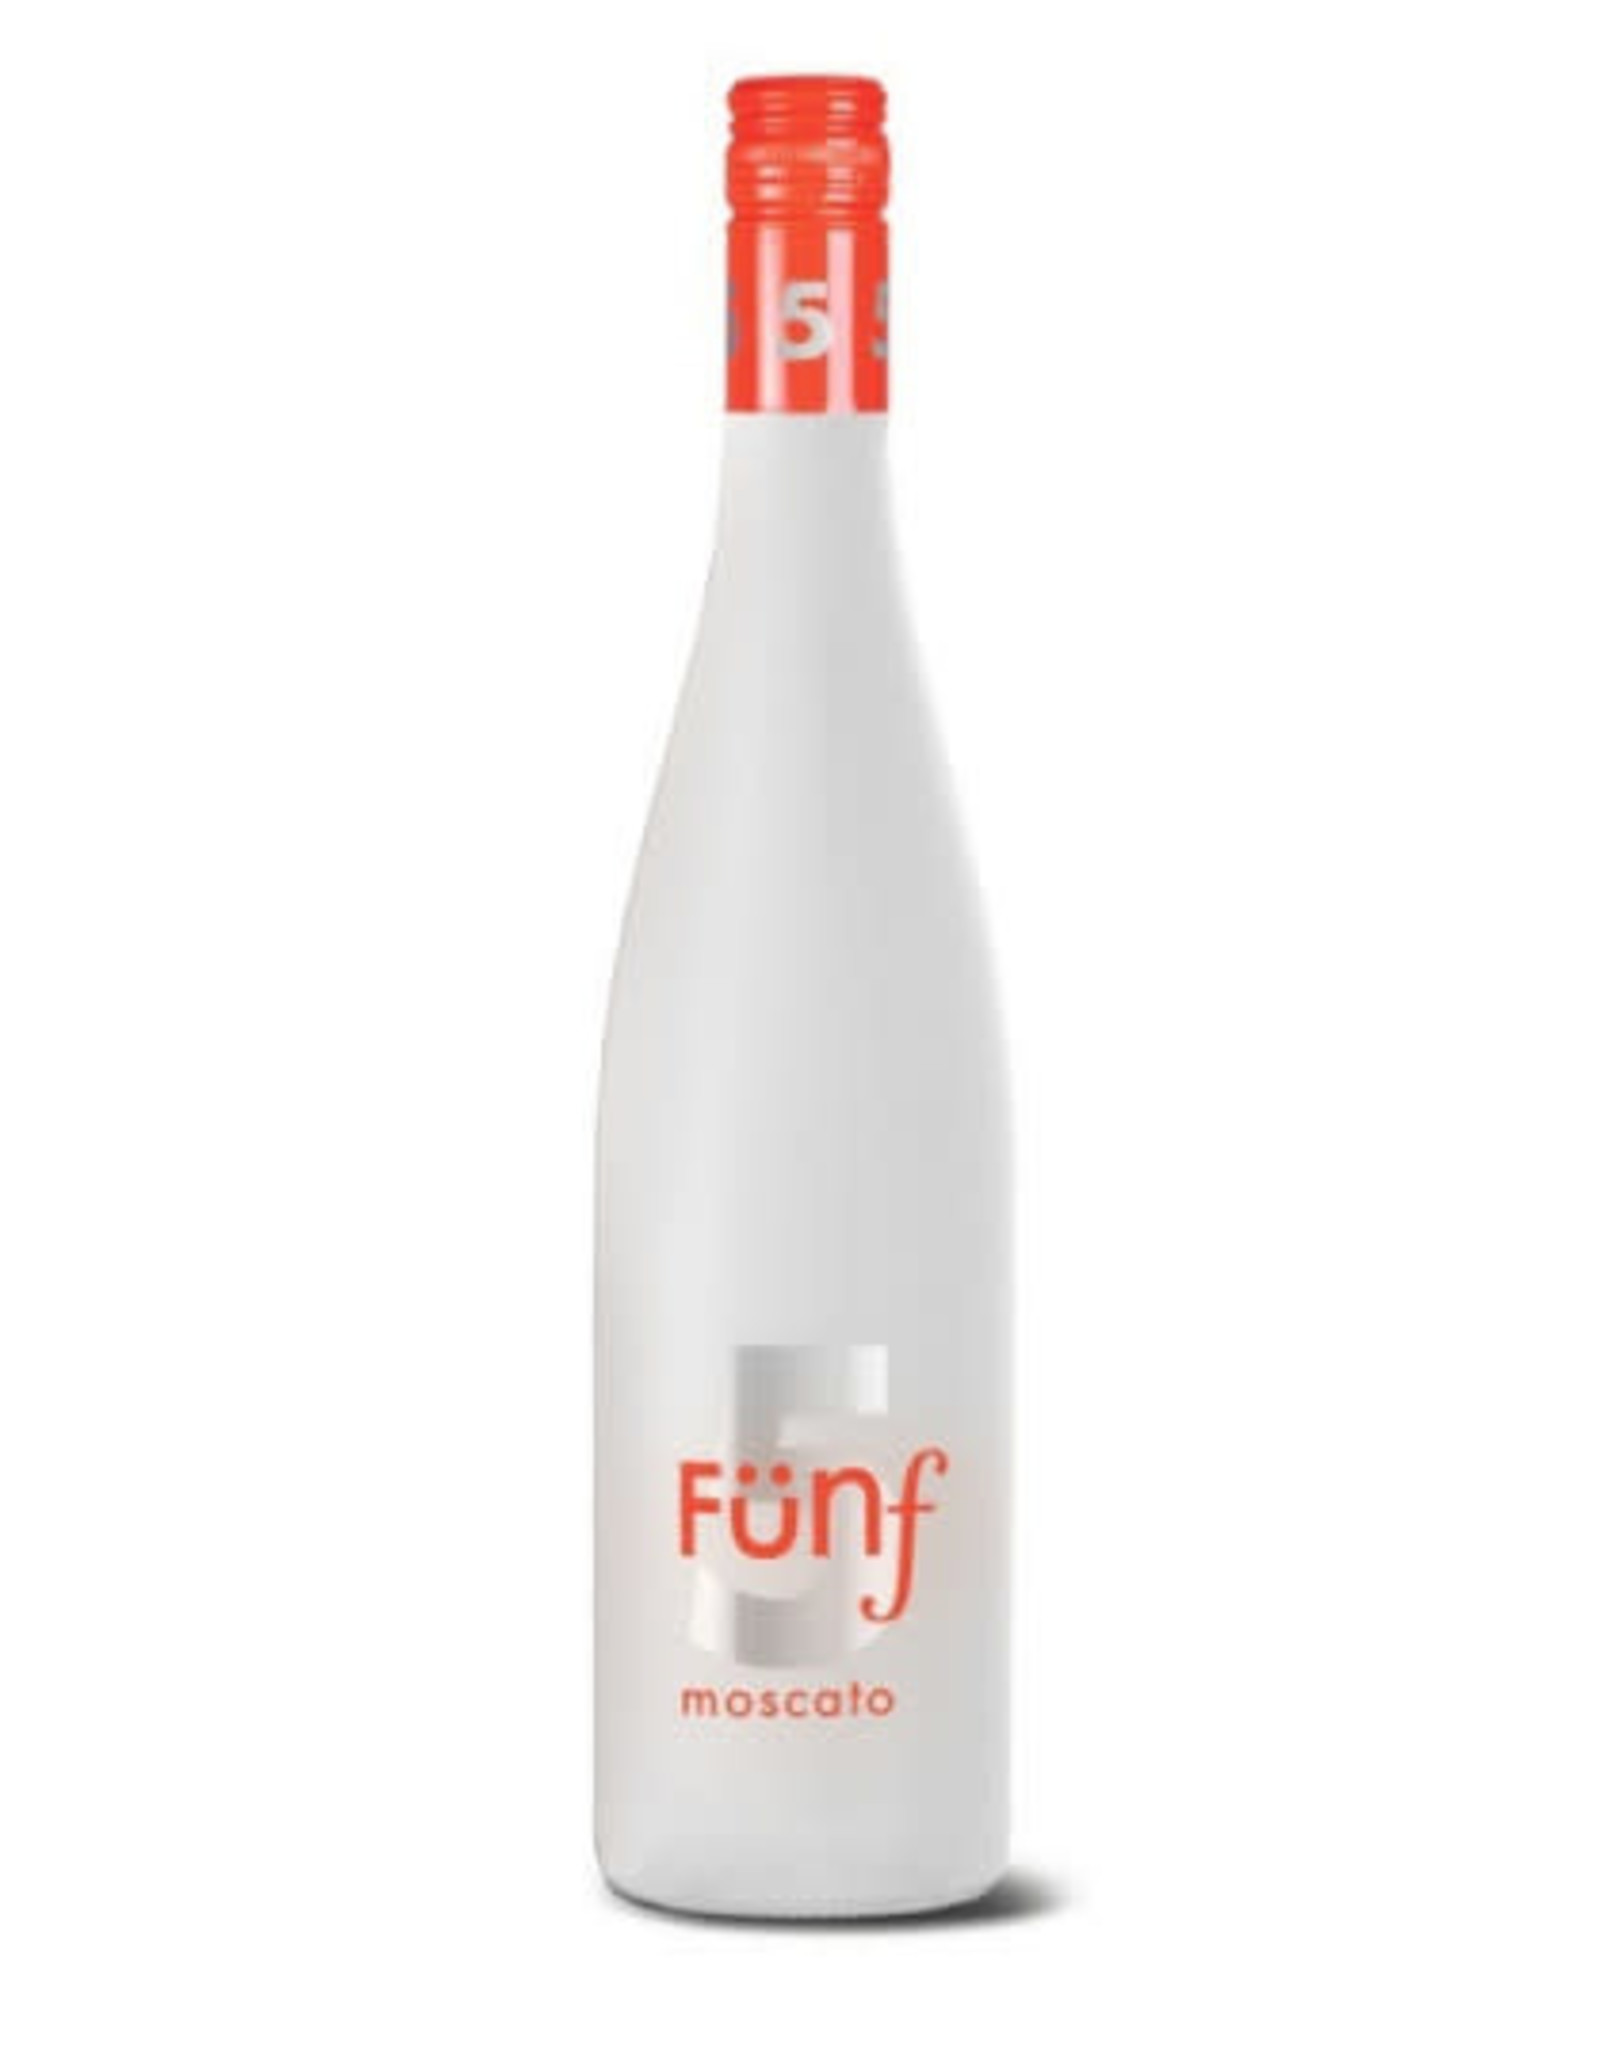 FUNF 5 MOSCATO 750ML